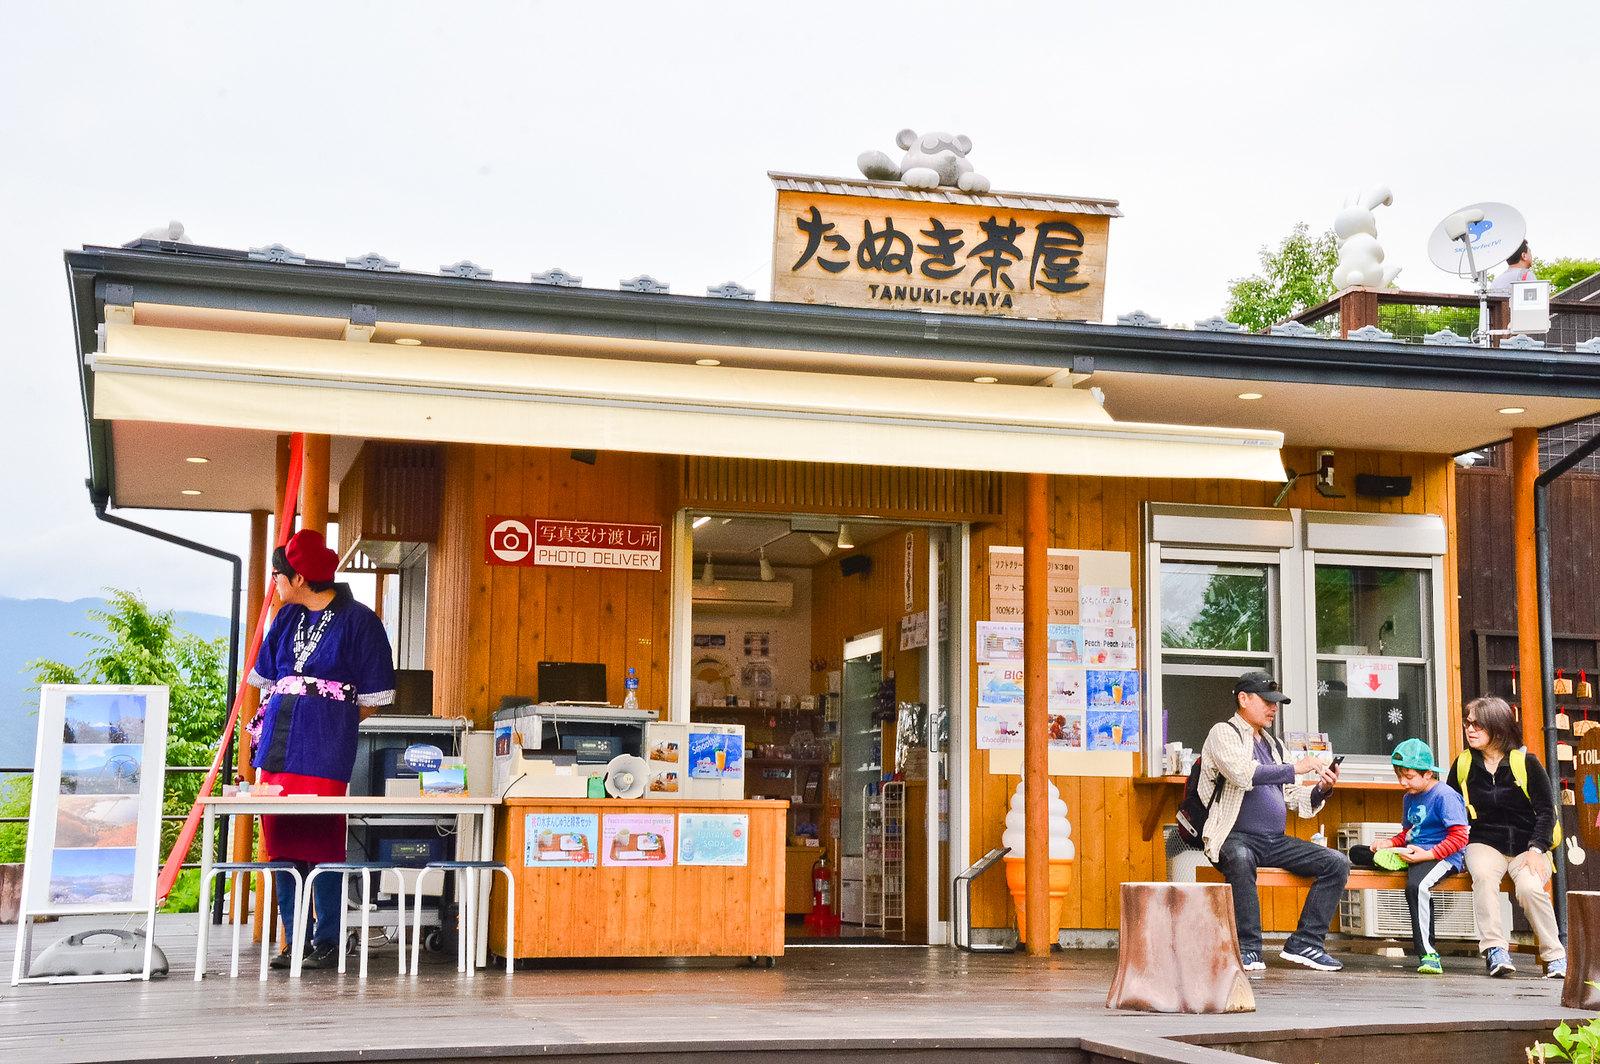 Mt. Kachi Kachi, Kawaguchiko